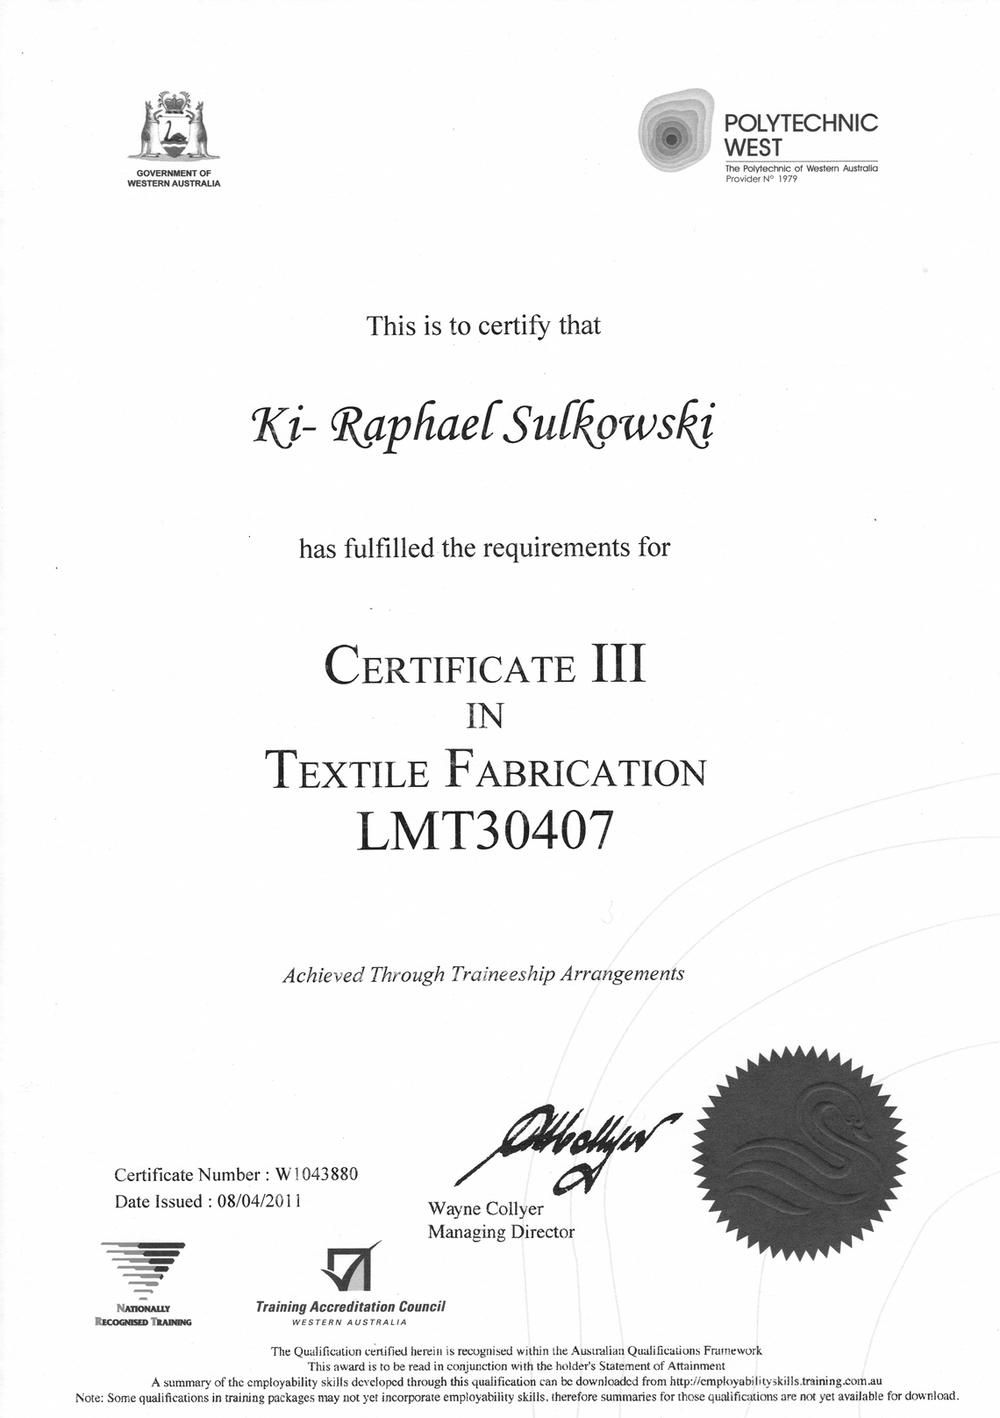 k1 sail marine trimming qualification